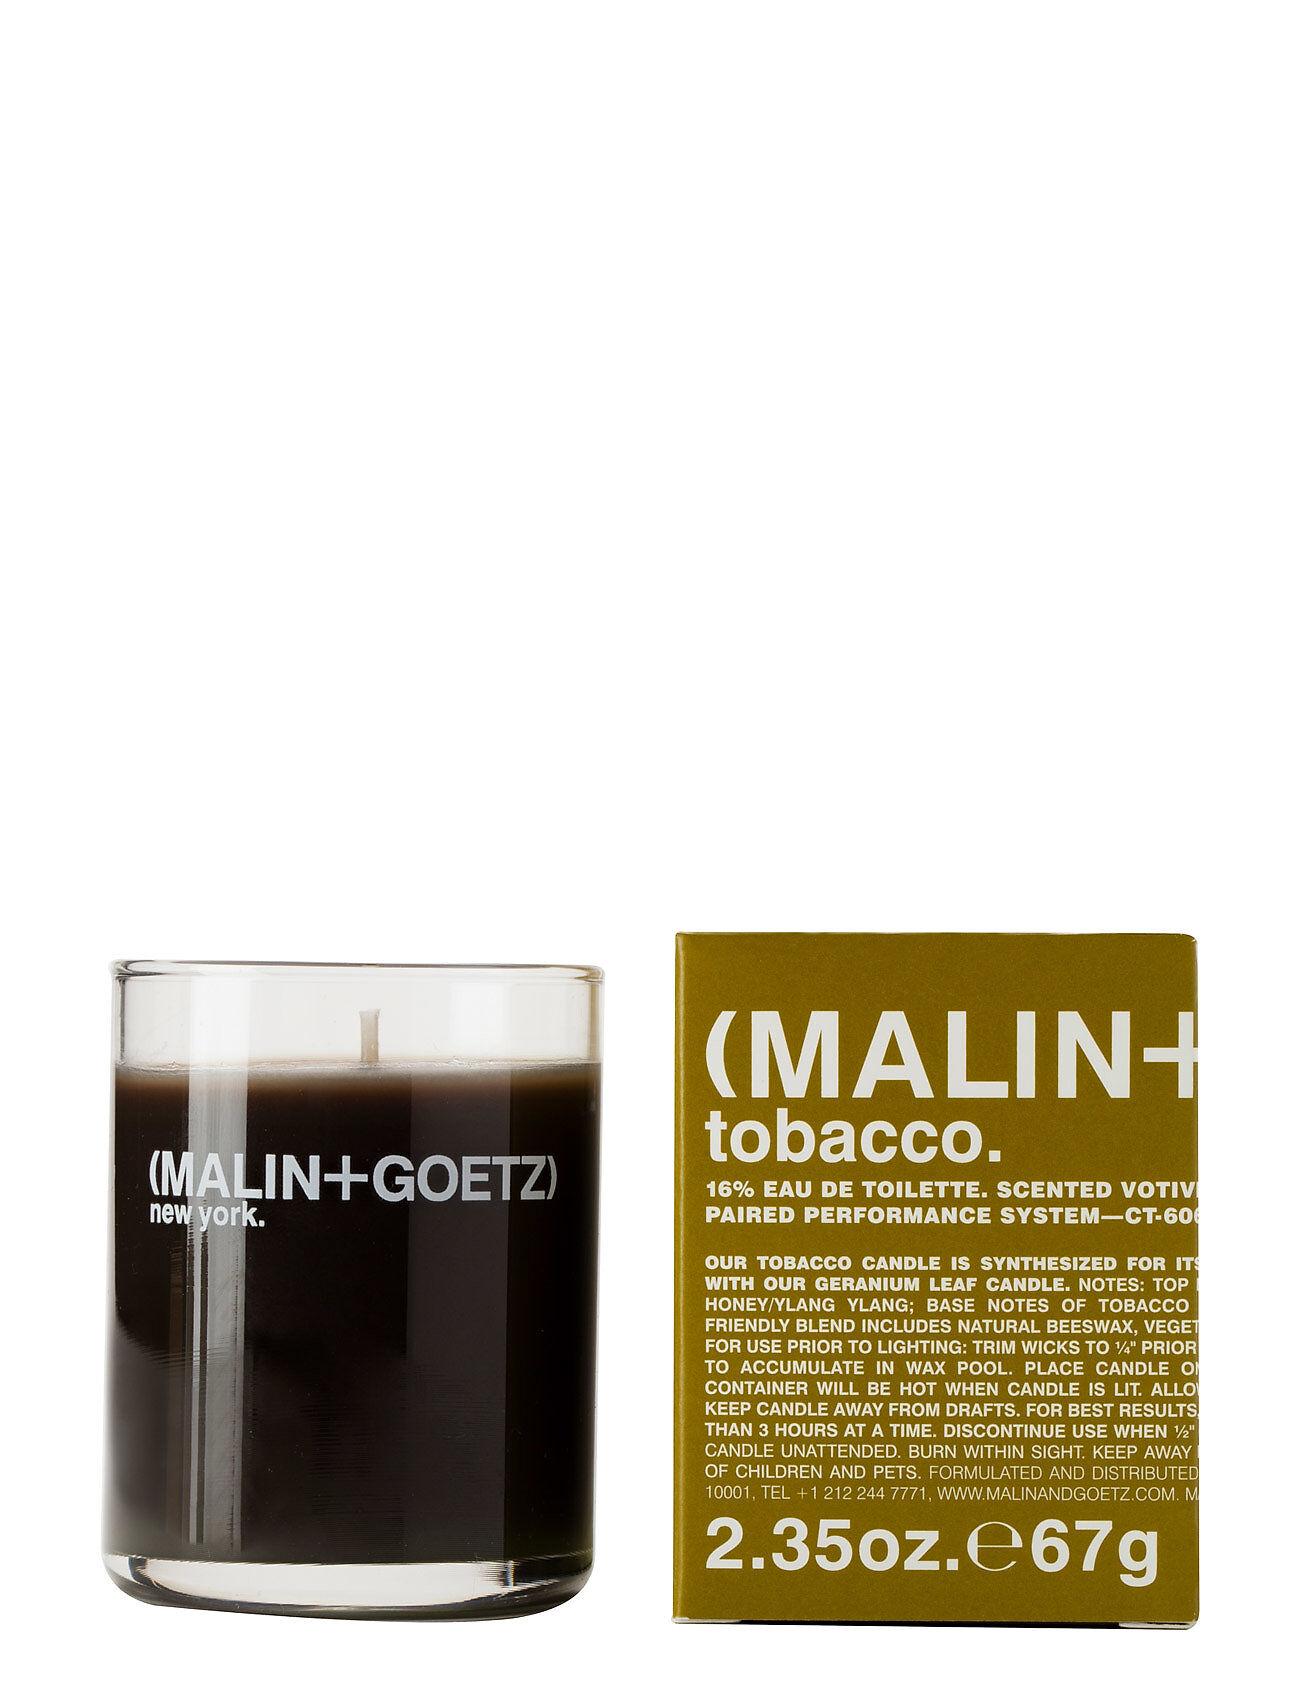 Malin+Goetz Tobacco Votive Candle